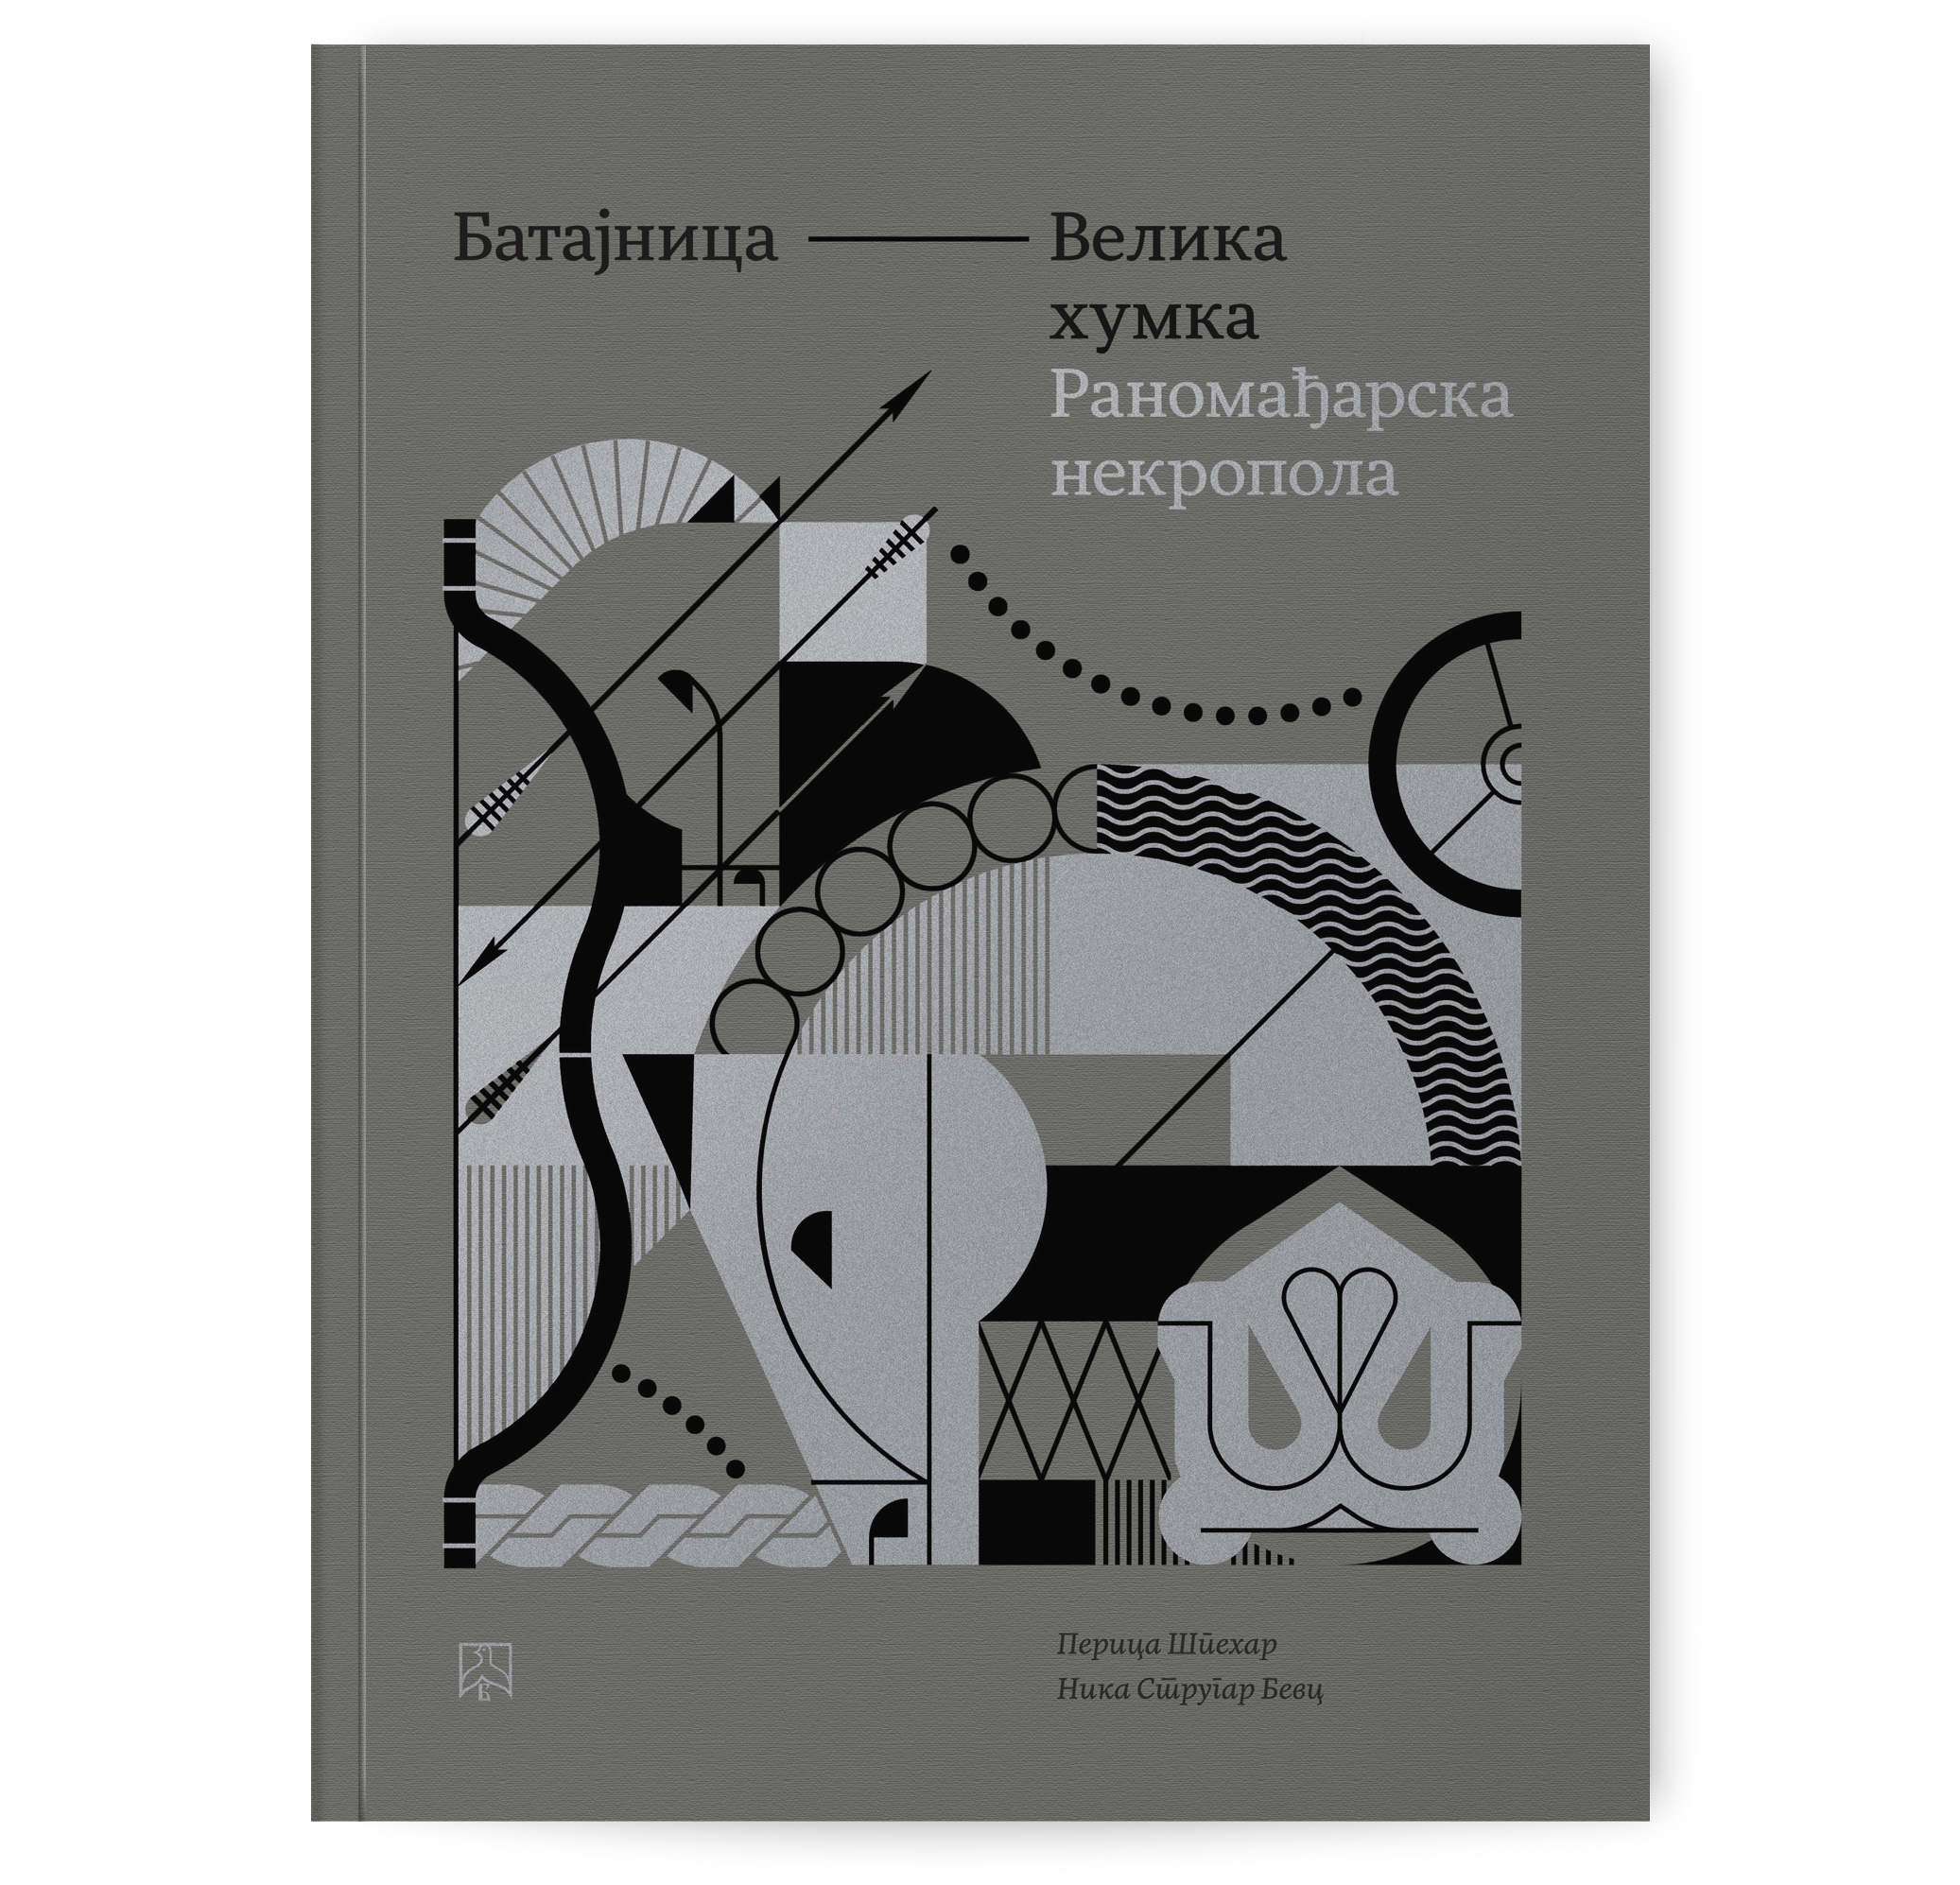 aleksandar-savic_early-hungarian-necropolis_bookcover